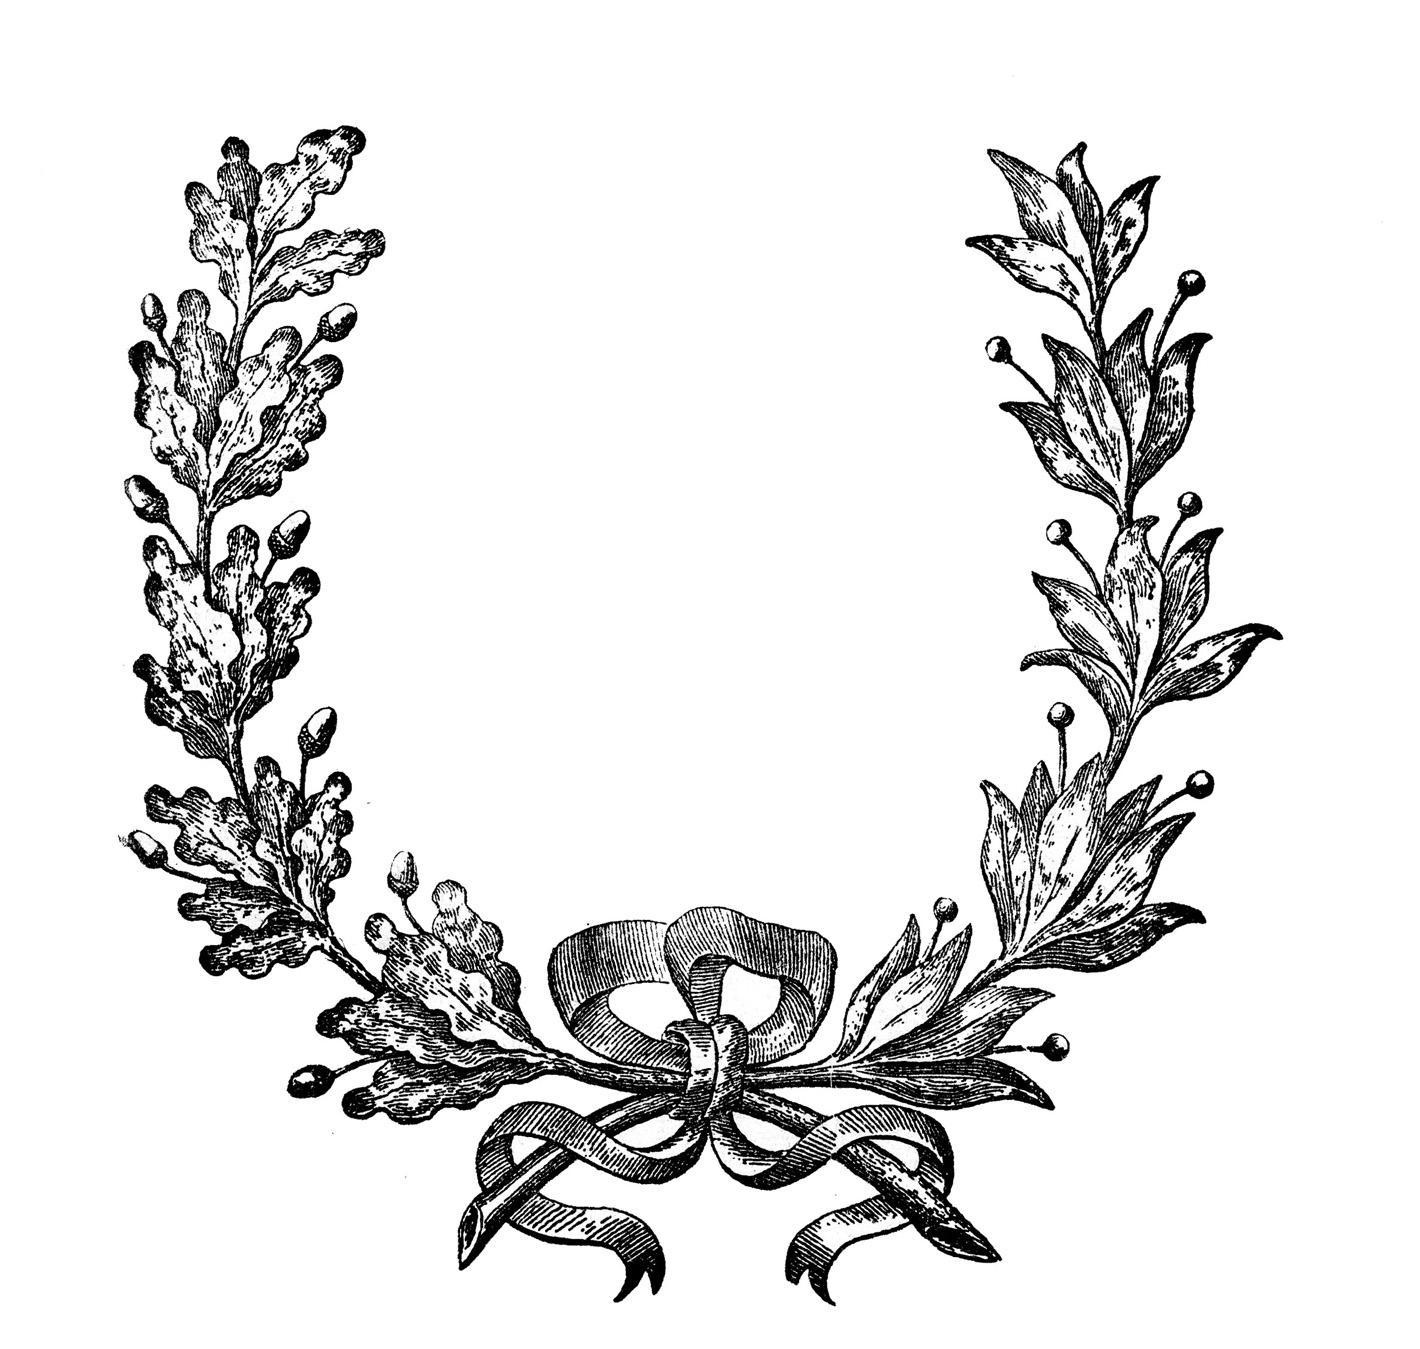 Goblet clipart vintage french Vintage The Vintage Engraving Engraving